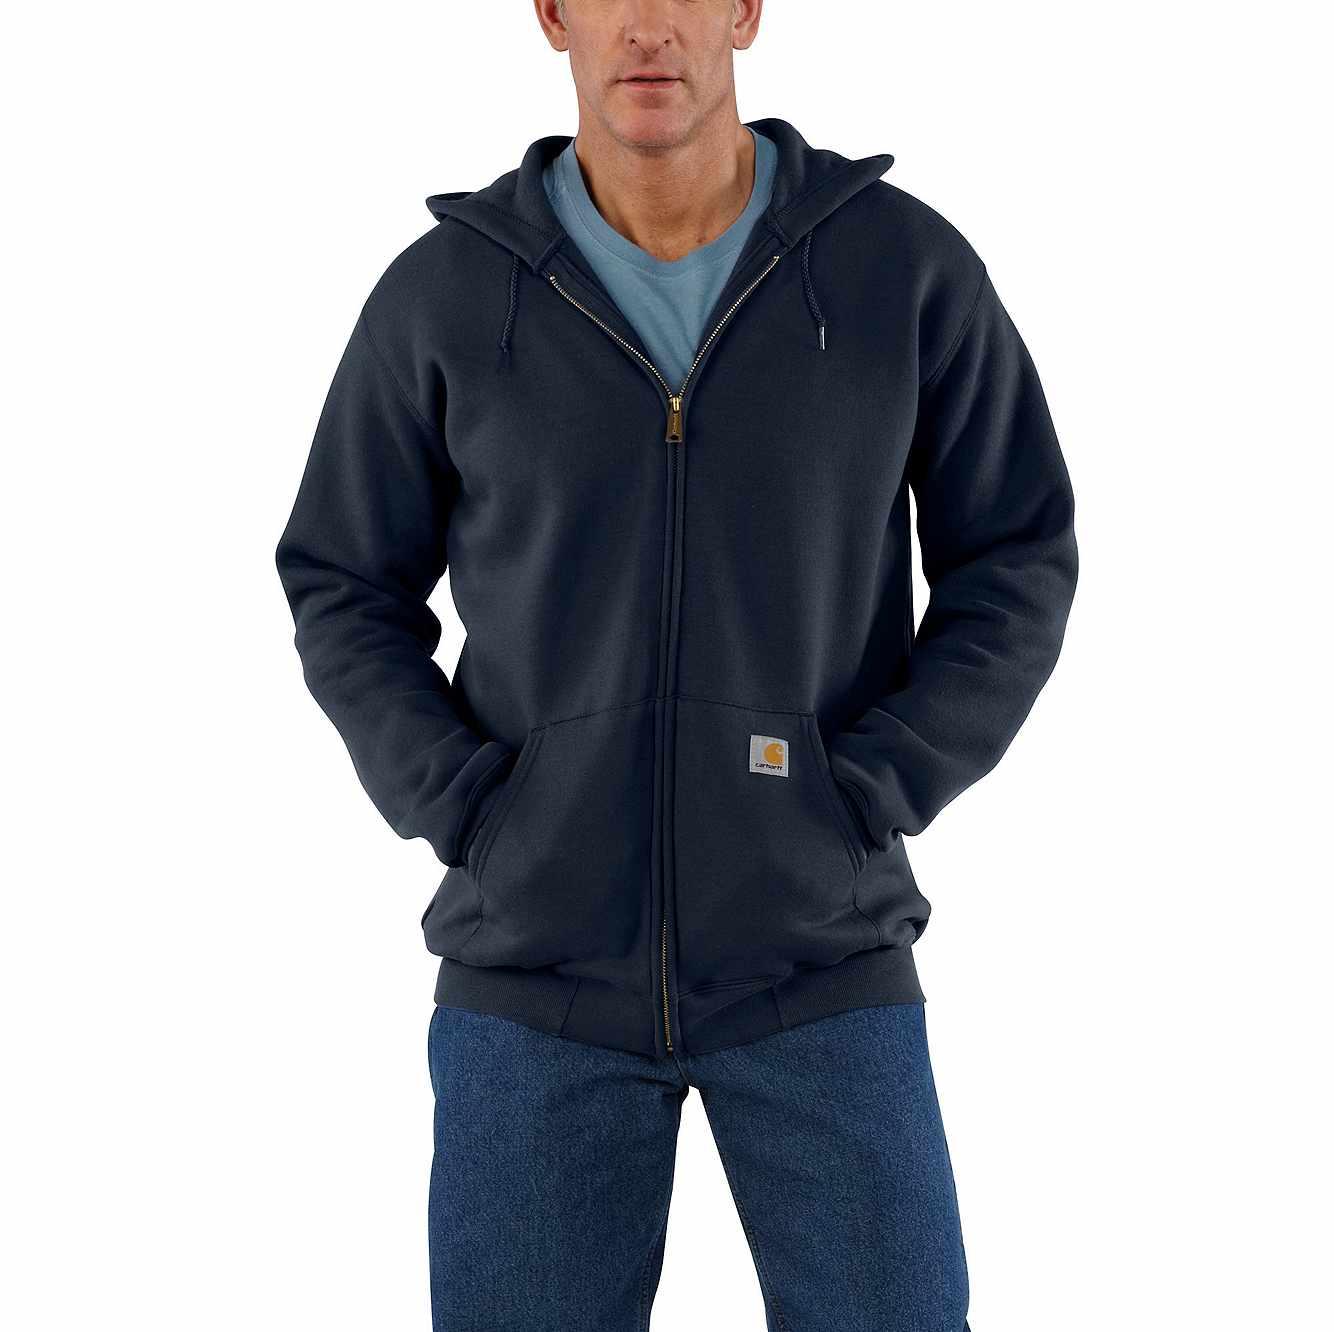 Picture of Midweight Hooded Zip-Front Sweatshirt in New Navy